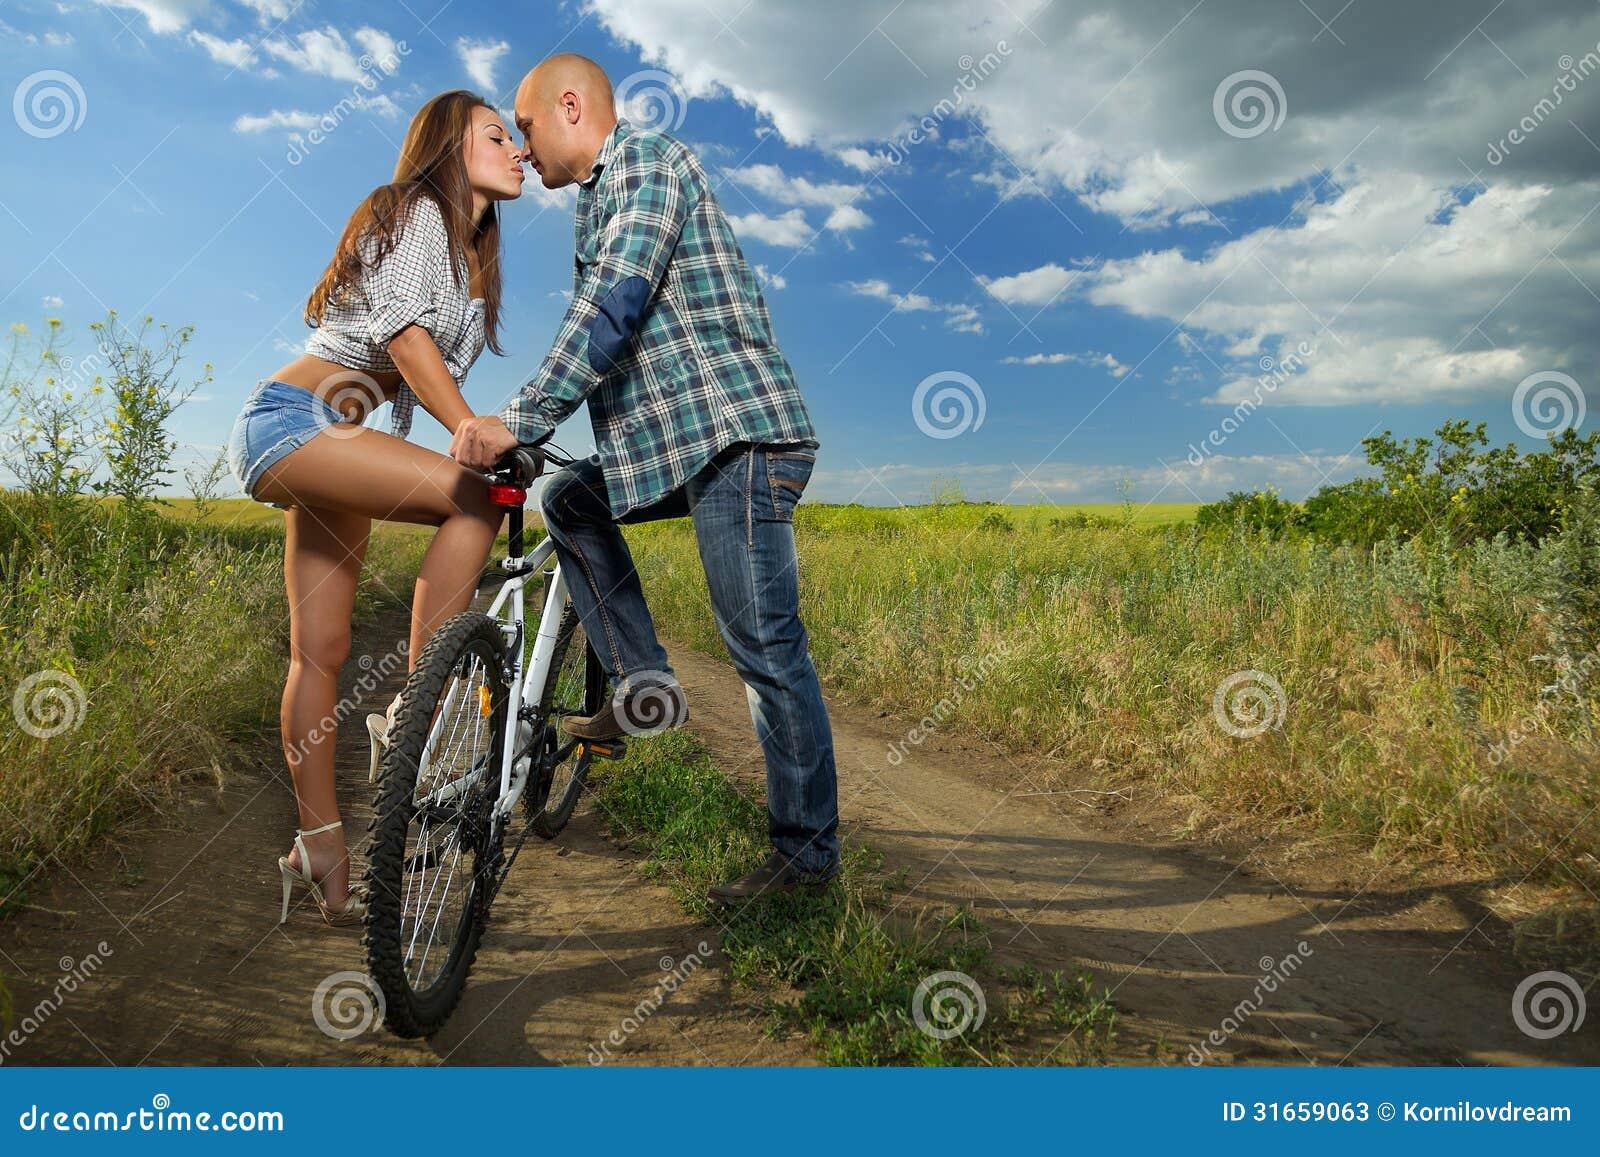 Bike Couple Stock Photos - Image: 31659063